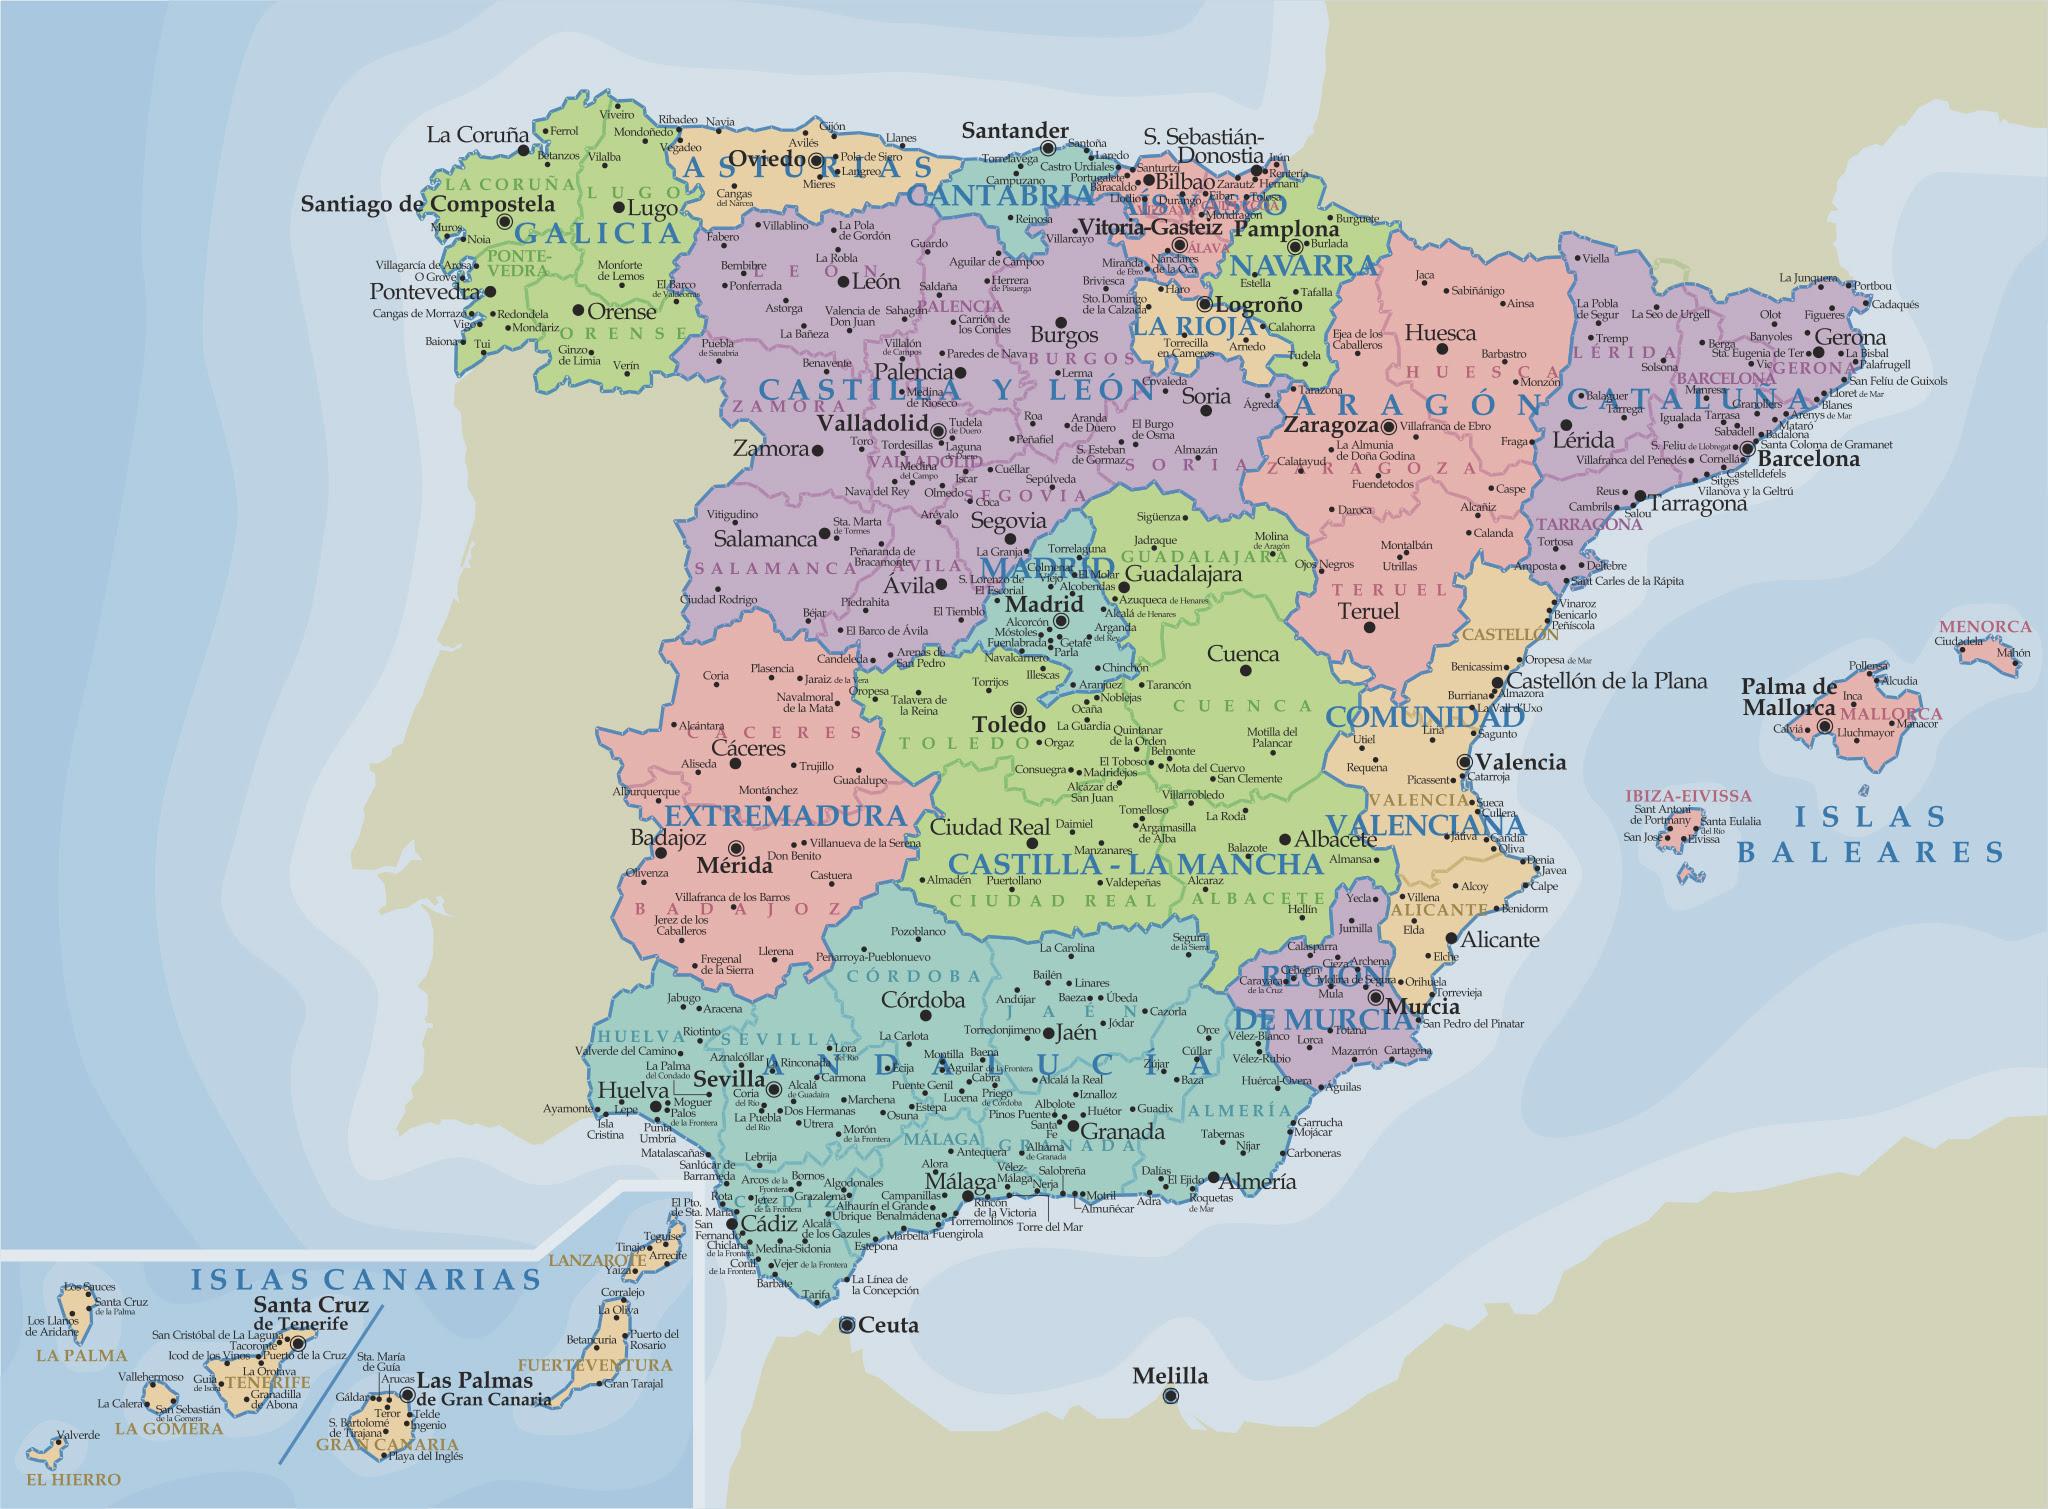 http://albertogarcia.files.wordpress.com/2008/10/mapa_politico_espana.jpg